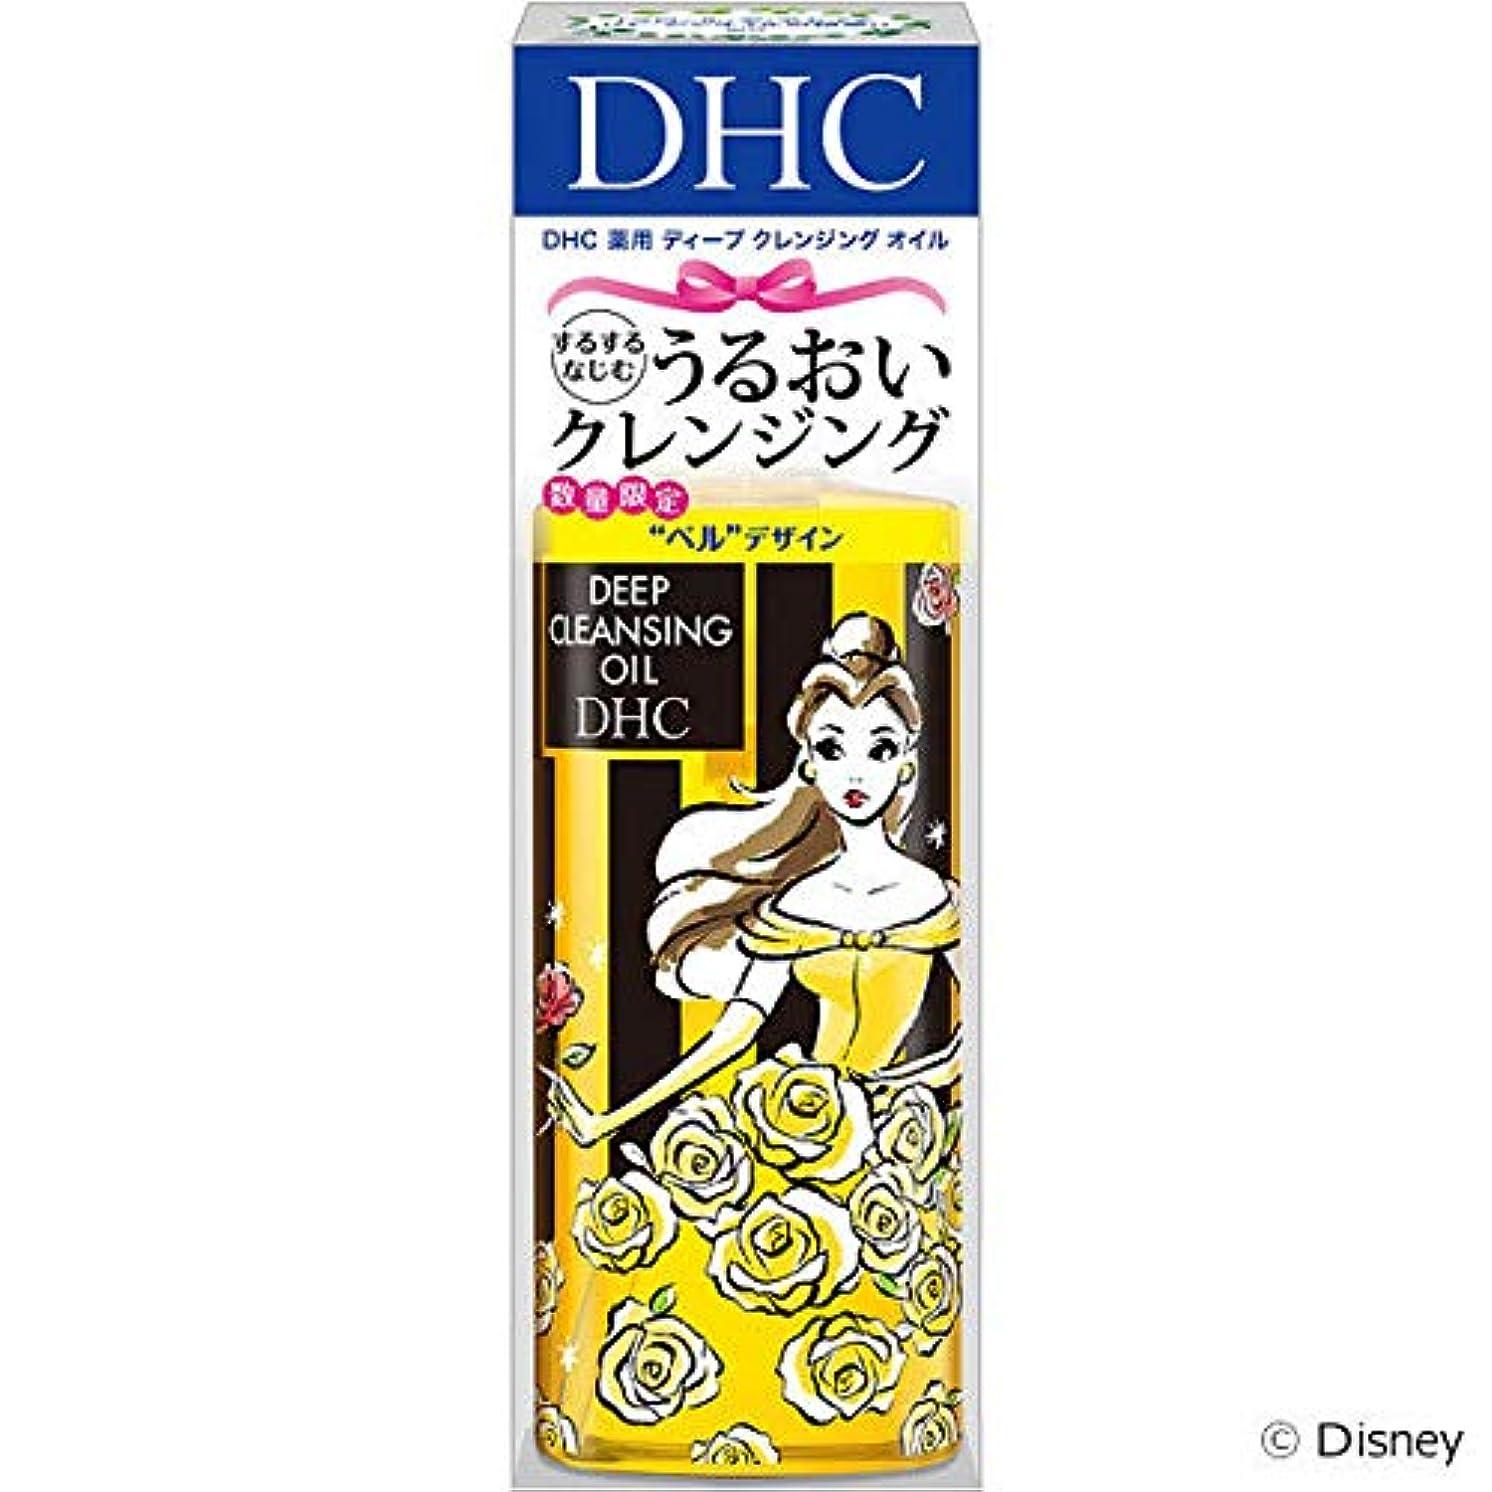 DHC 薬用 ディープクレンジング オイル ベル SSL 150ml